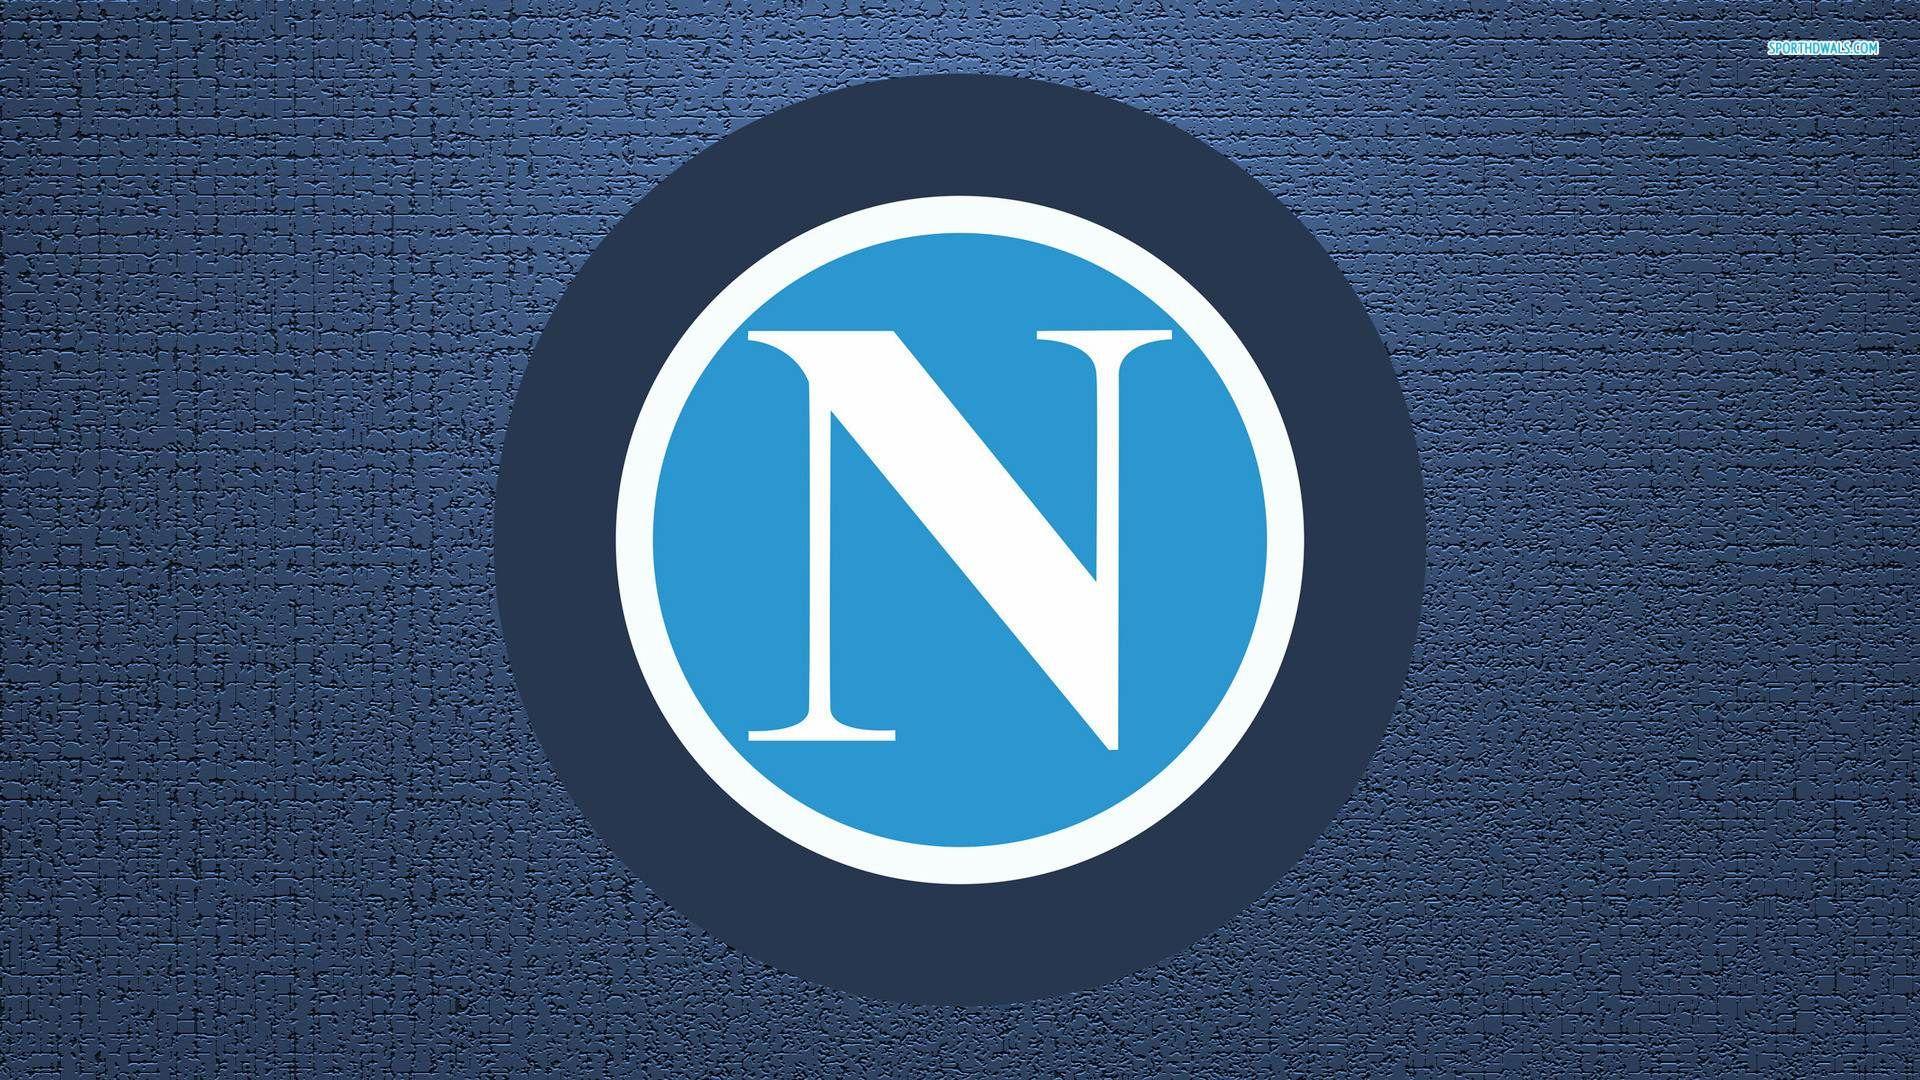 Napoli HD Wallpaper | Walpaper logo Clubs | Pinterest | Hd wallpaper